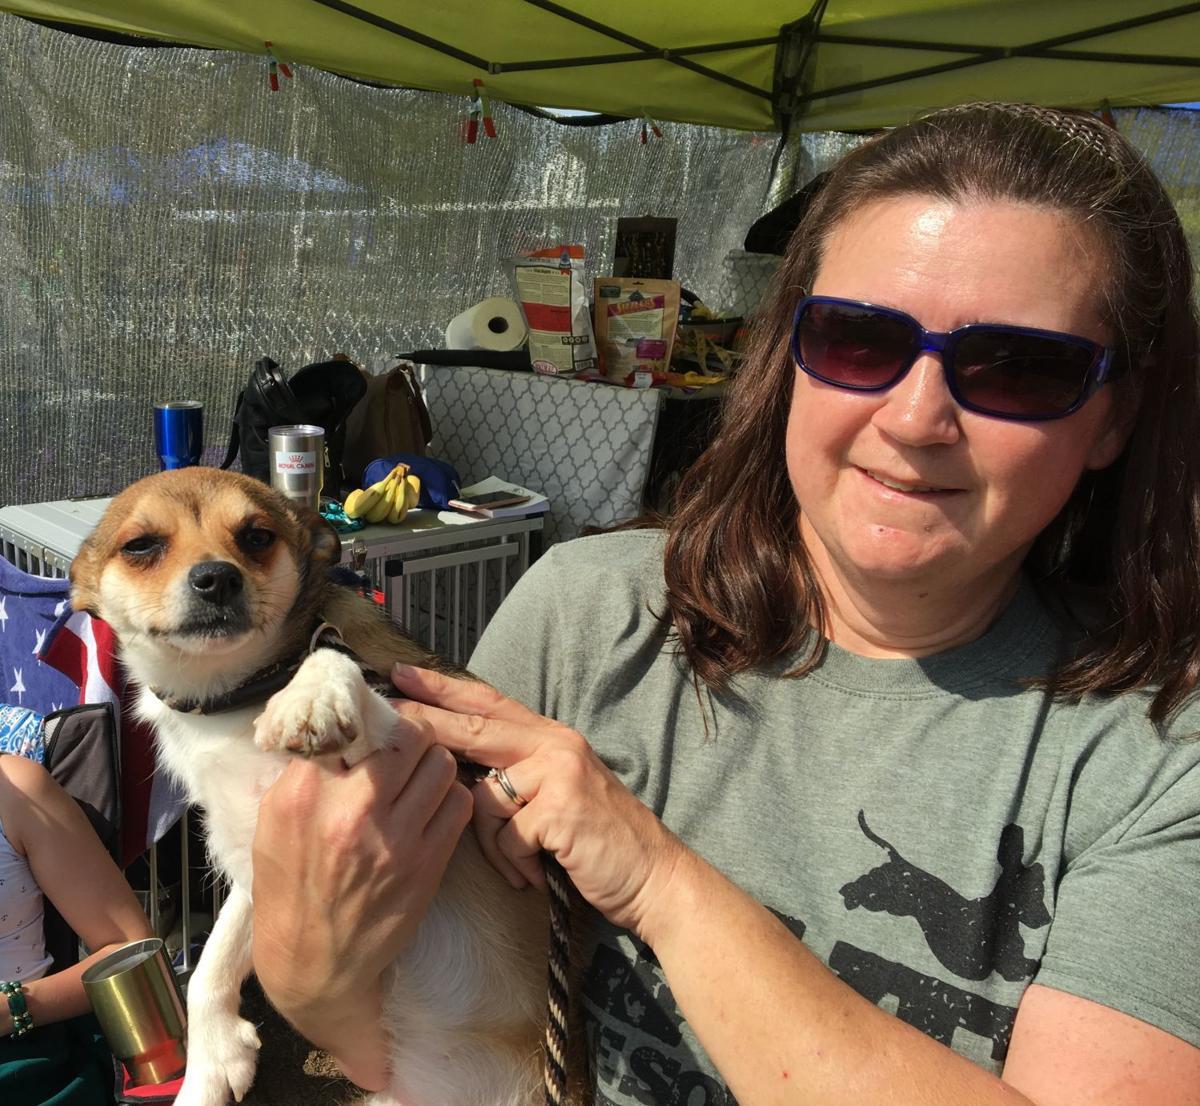 Dog Show - Pikku, a Norwegian Lundehund, & Carrie Riley